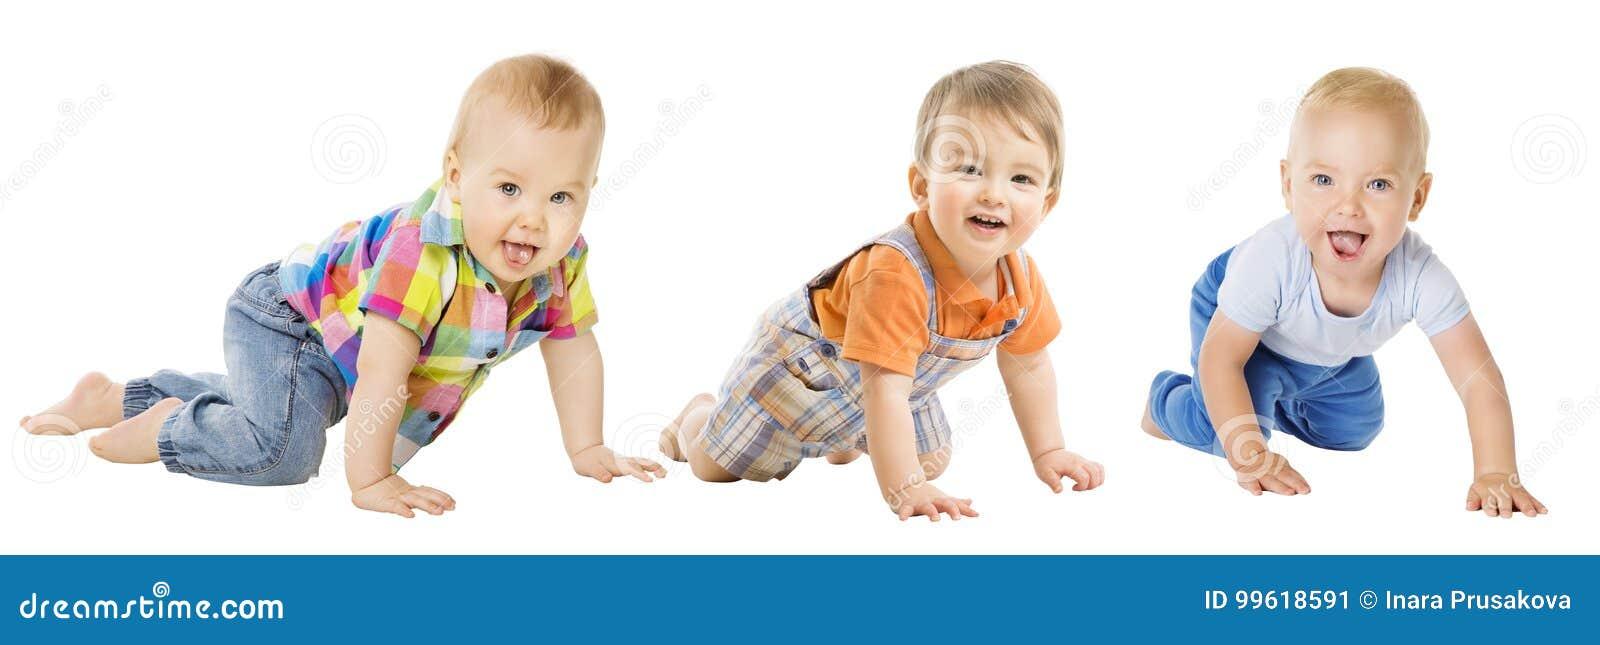 Baby Boys Group, Crawling Infant Kid, Toddler Child Crawl